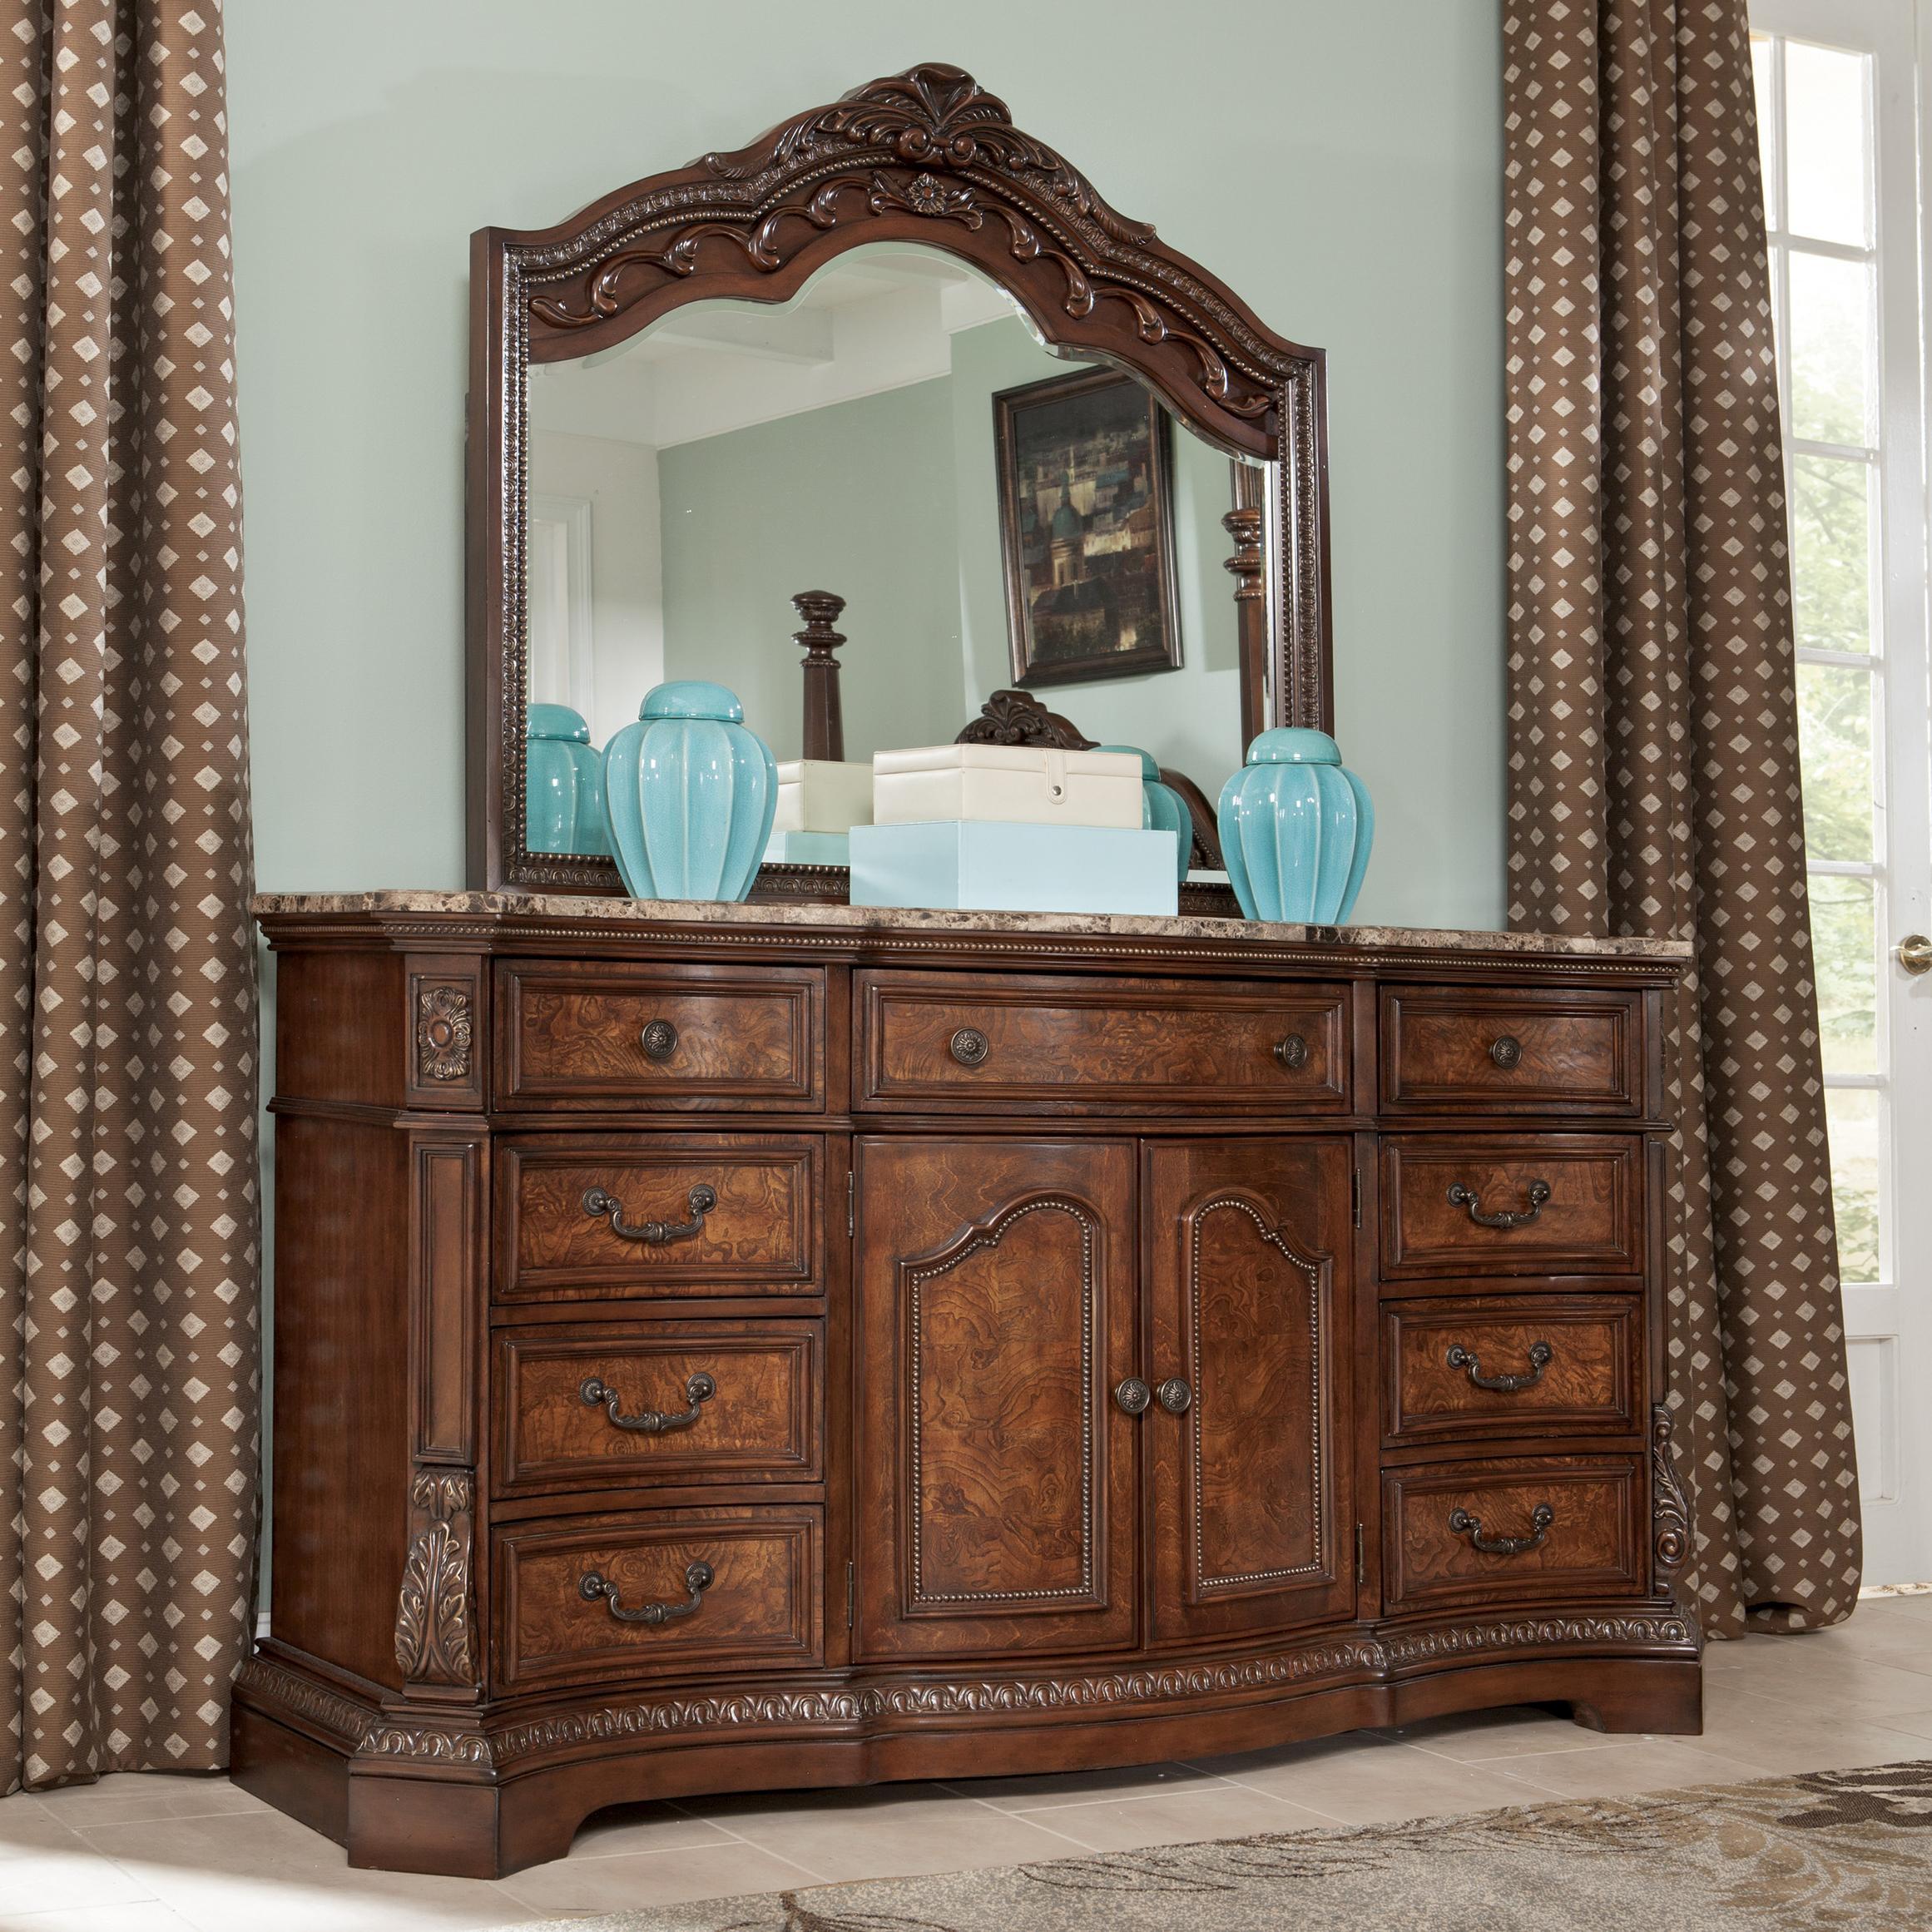 Superb Millennium Ledelle Serpentine Shape Dresser With Natural Marble Parquetry  Top U0026 Bedroom Dresser Mirror Design Inspirations